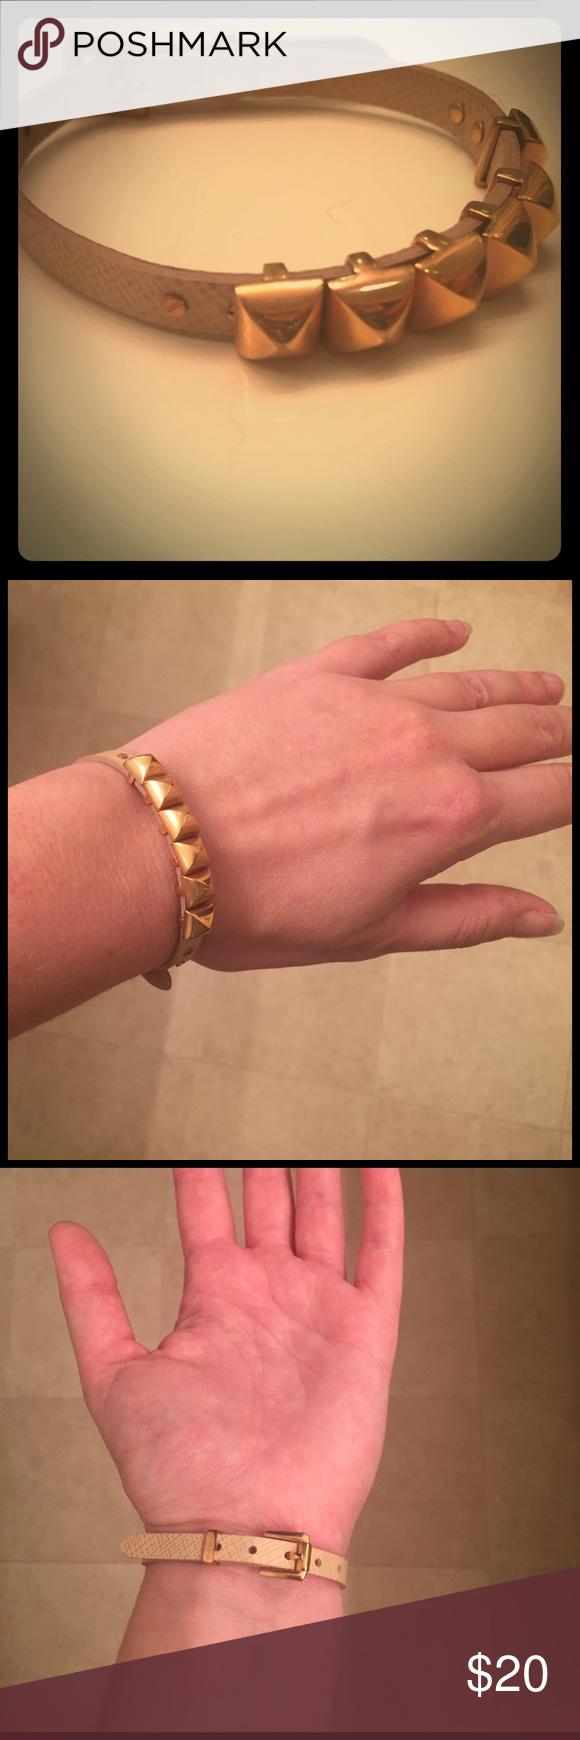 Michael Kors Studded Bracelet Rose Gold MK bracelet. Gently worn. Adjustable. Great accessory to stack or wear with a watch. Michael Kors Jewelry Bracelets